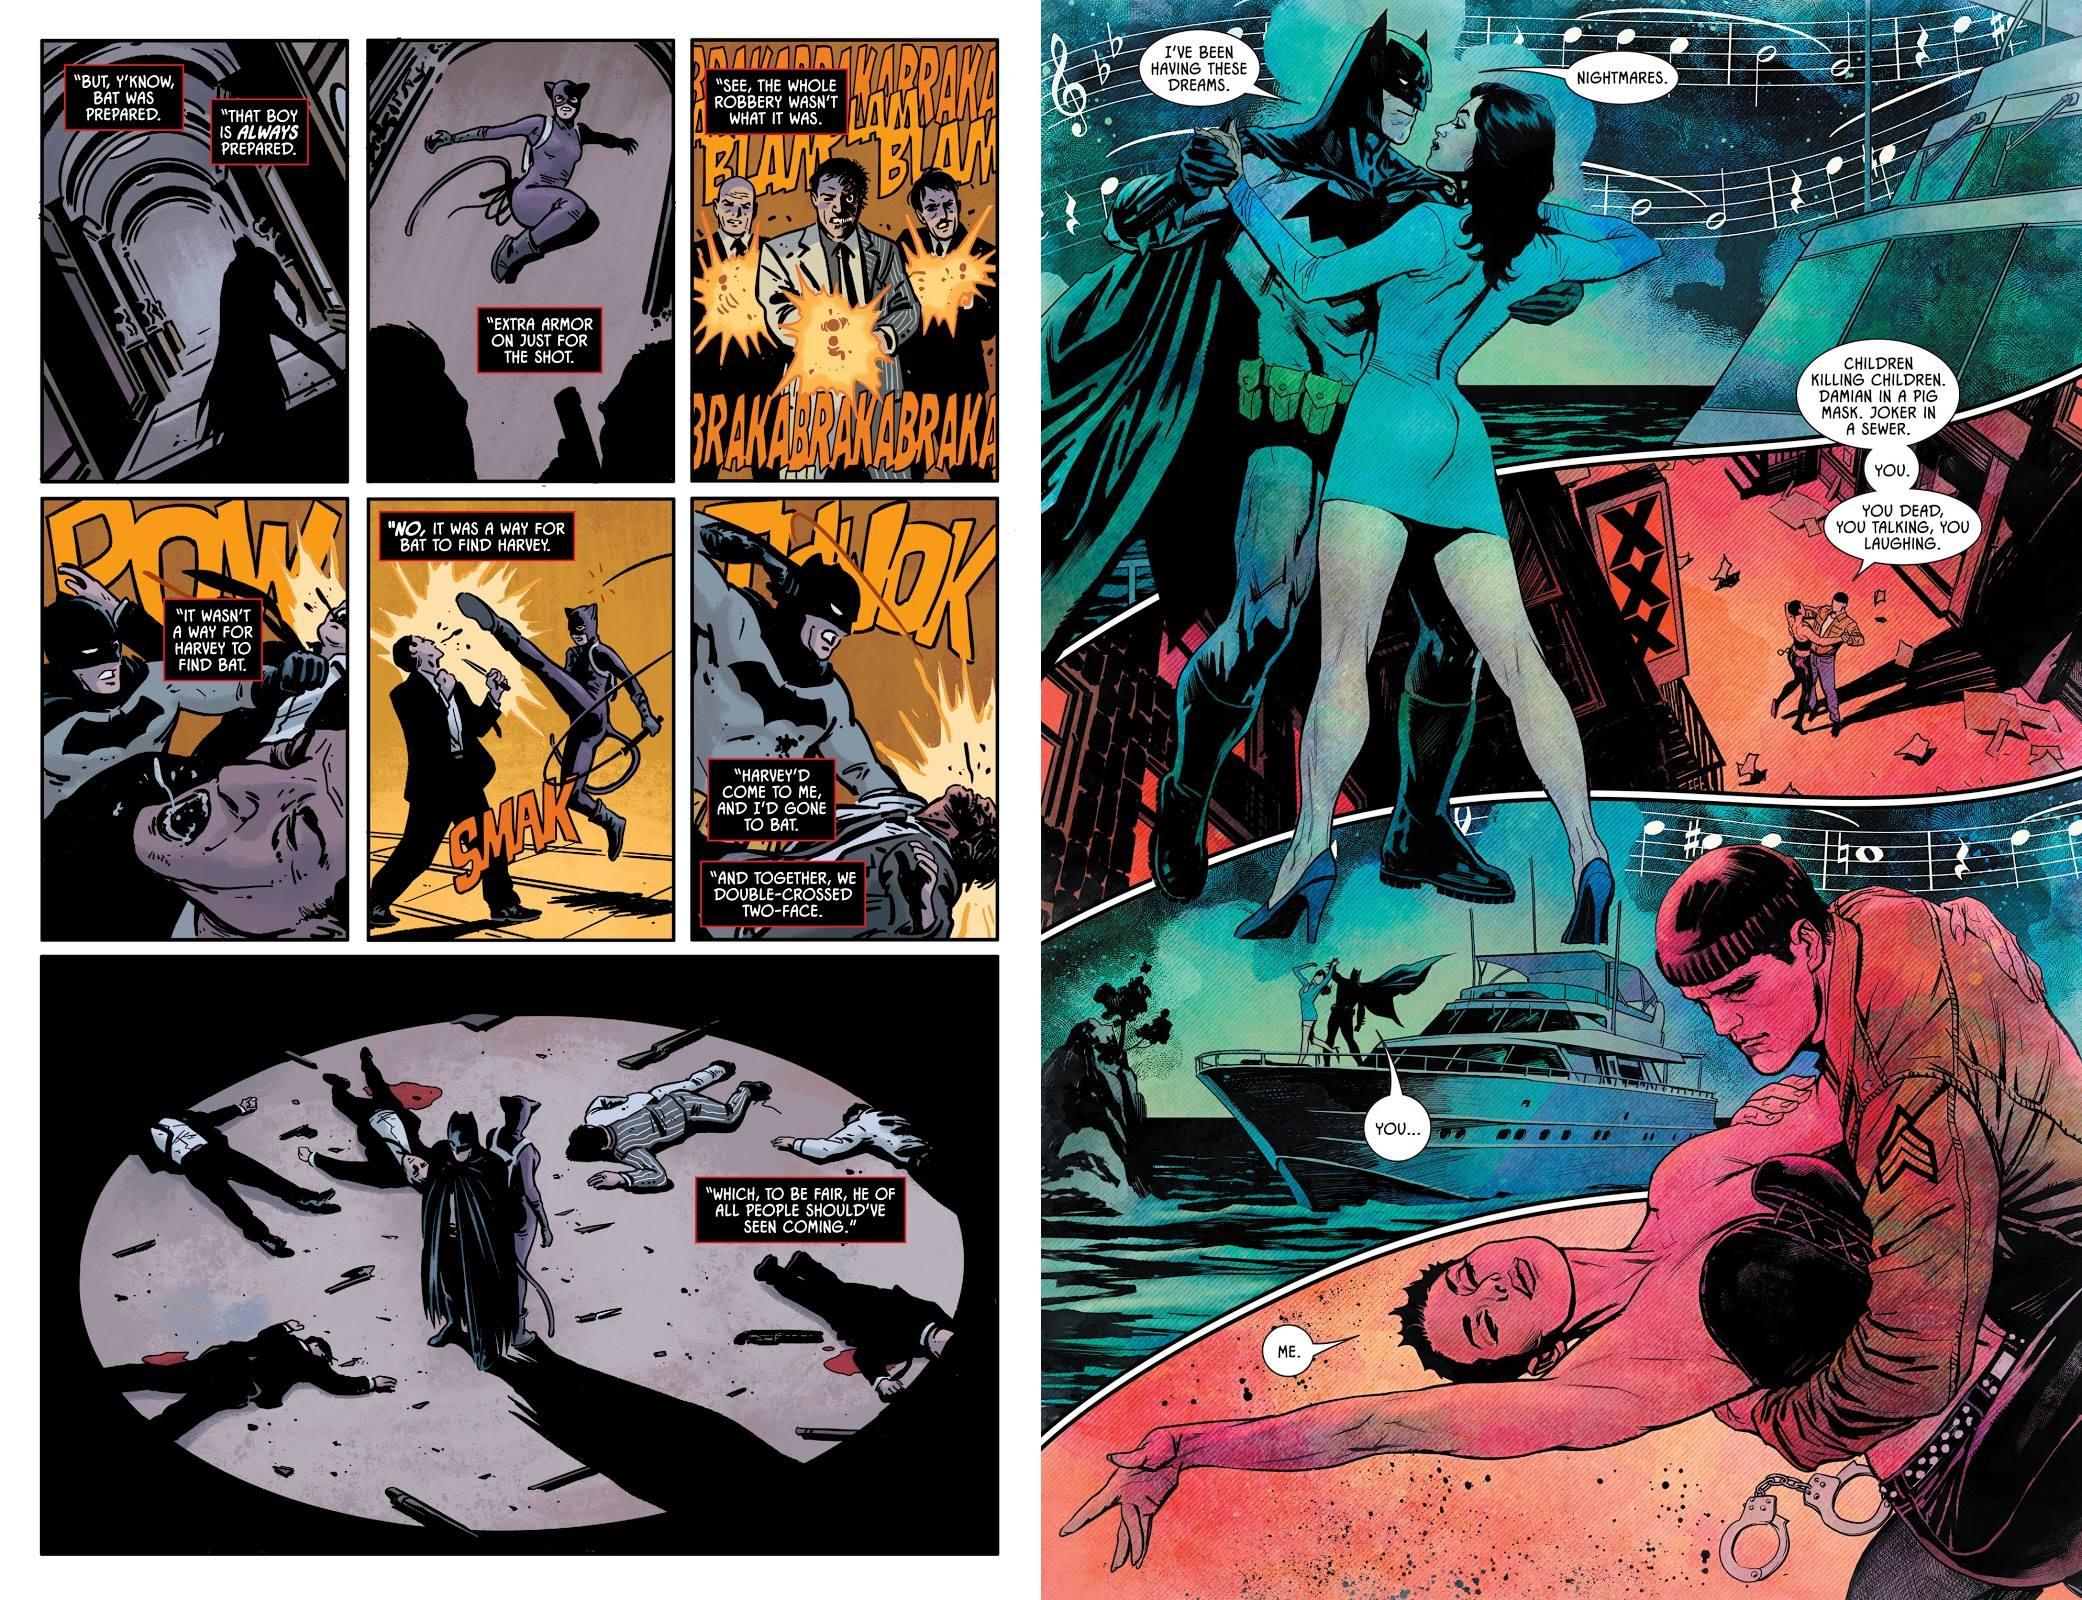 Batman Knightmares graphic novel review